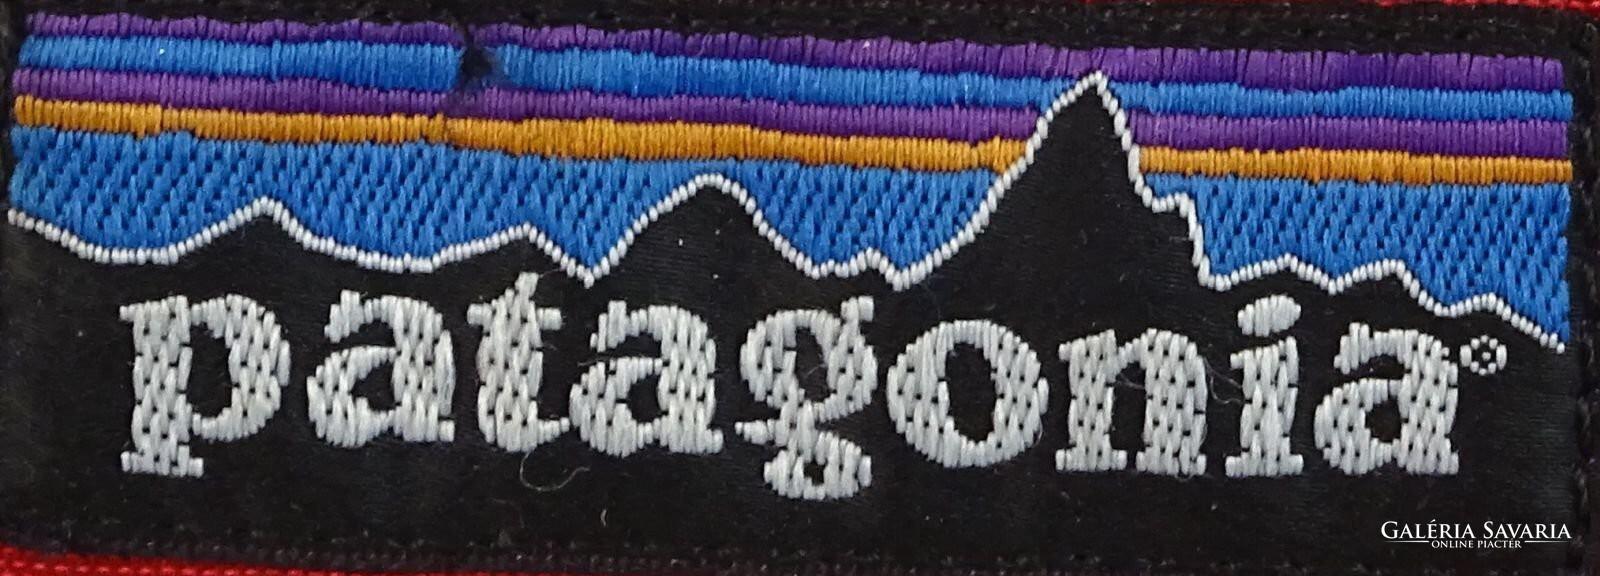 68e833dfb5e9 0W405 Patagonia hátizsák túrazsák - Gardrób | Galéria Savaria online ...